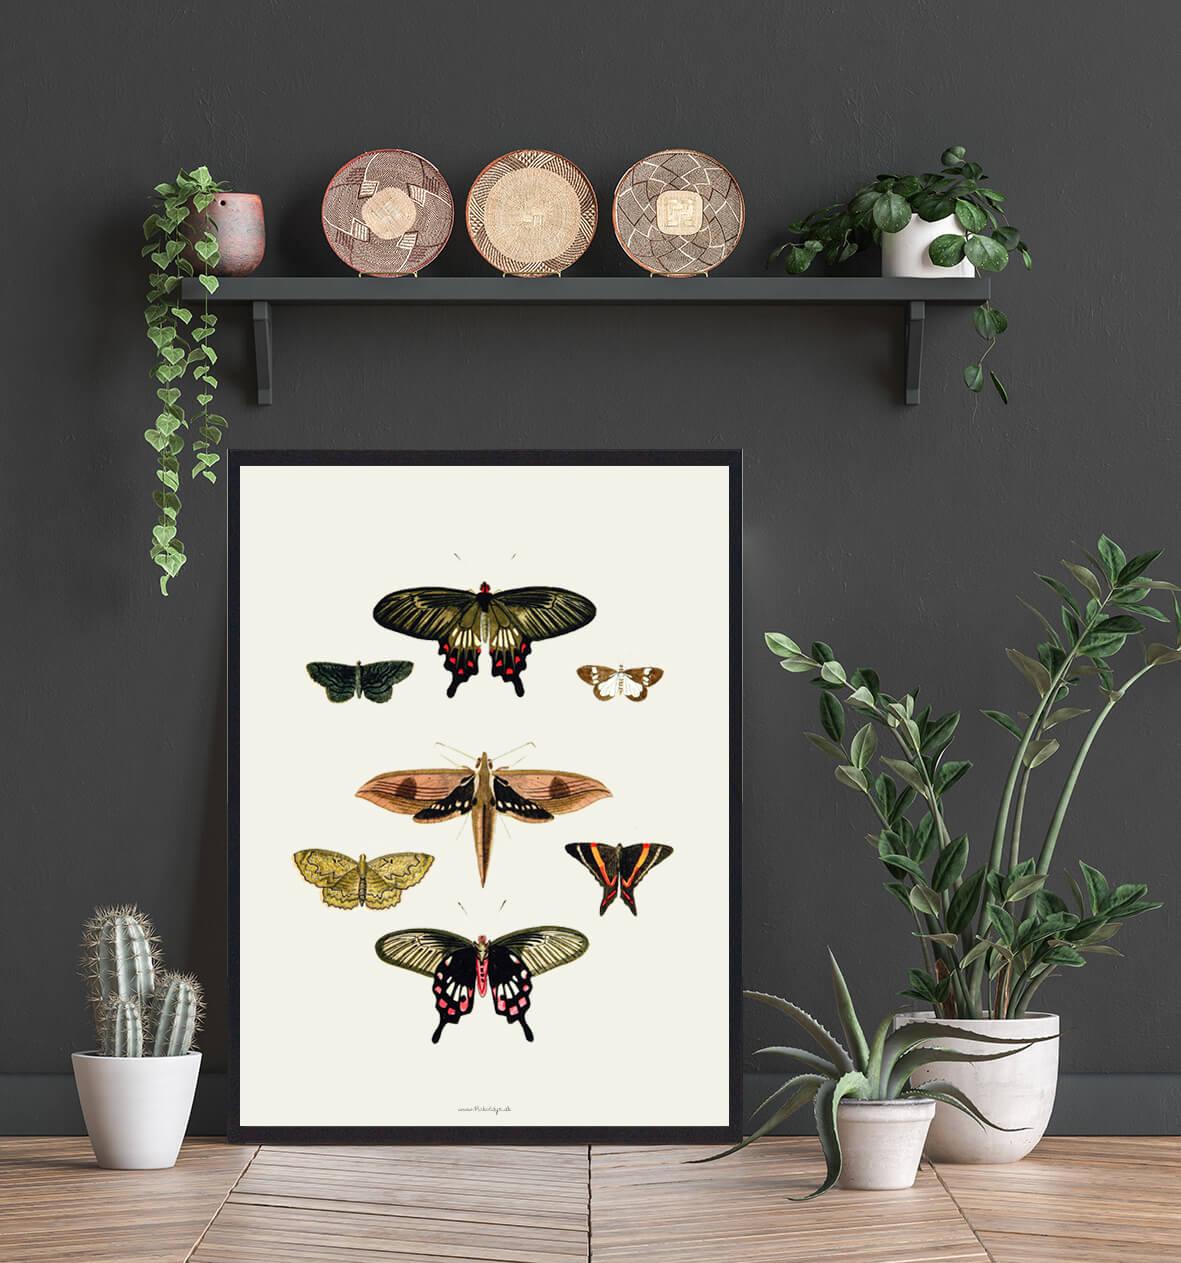 sommerfugle-plakat-koeb-3